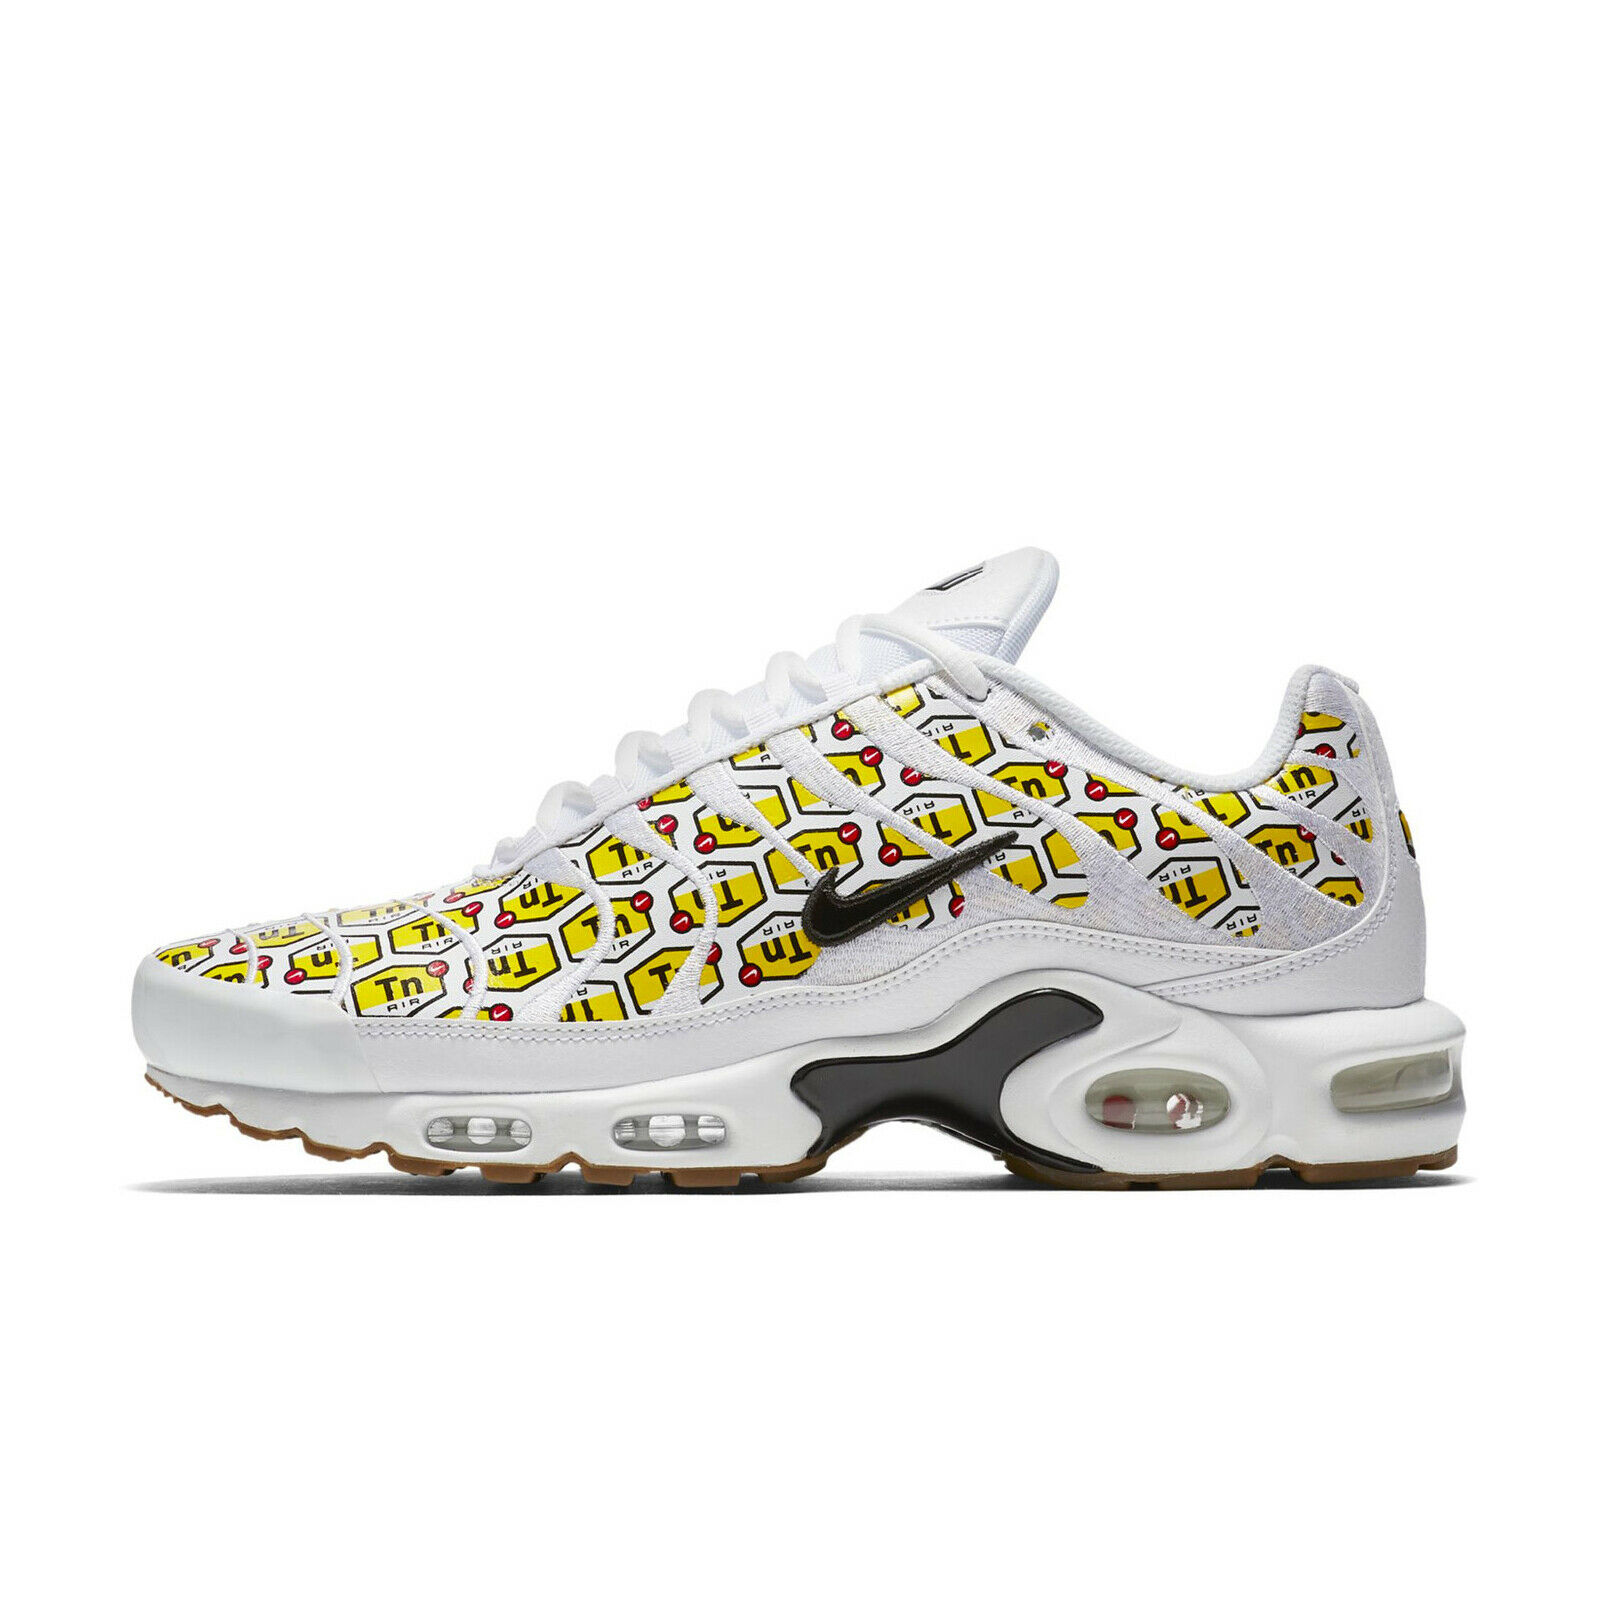 Nike Air Max Plus QS All Over Print White Black Yellow Gum 903827-100 Multi Size